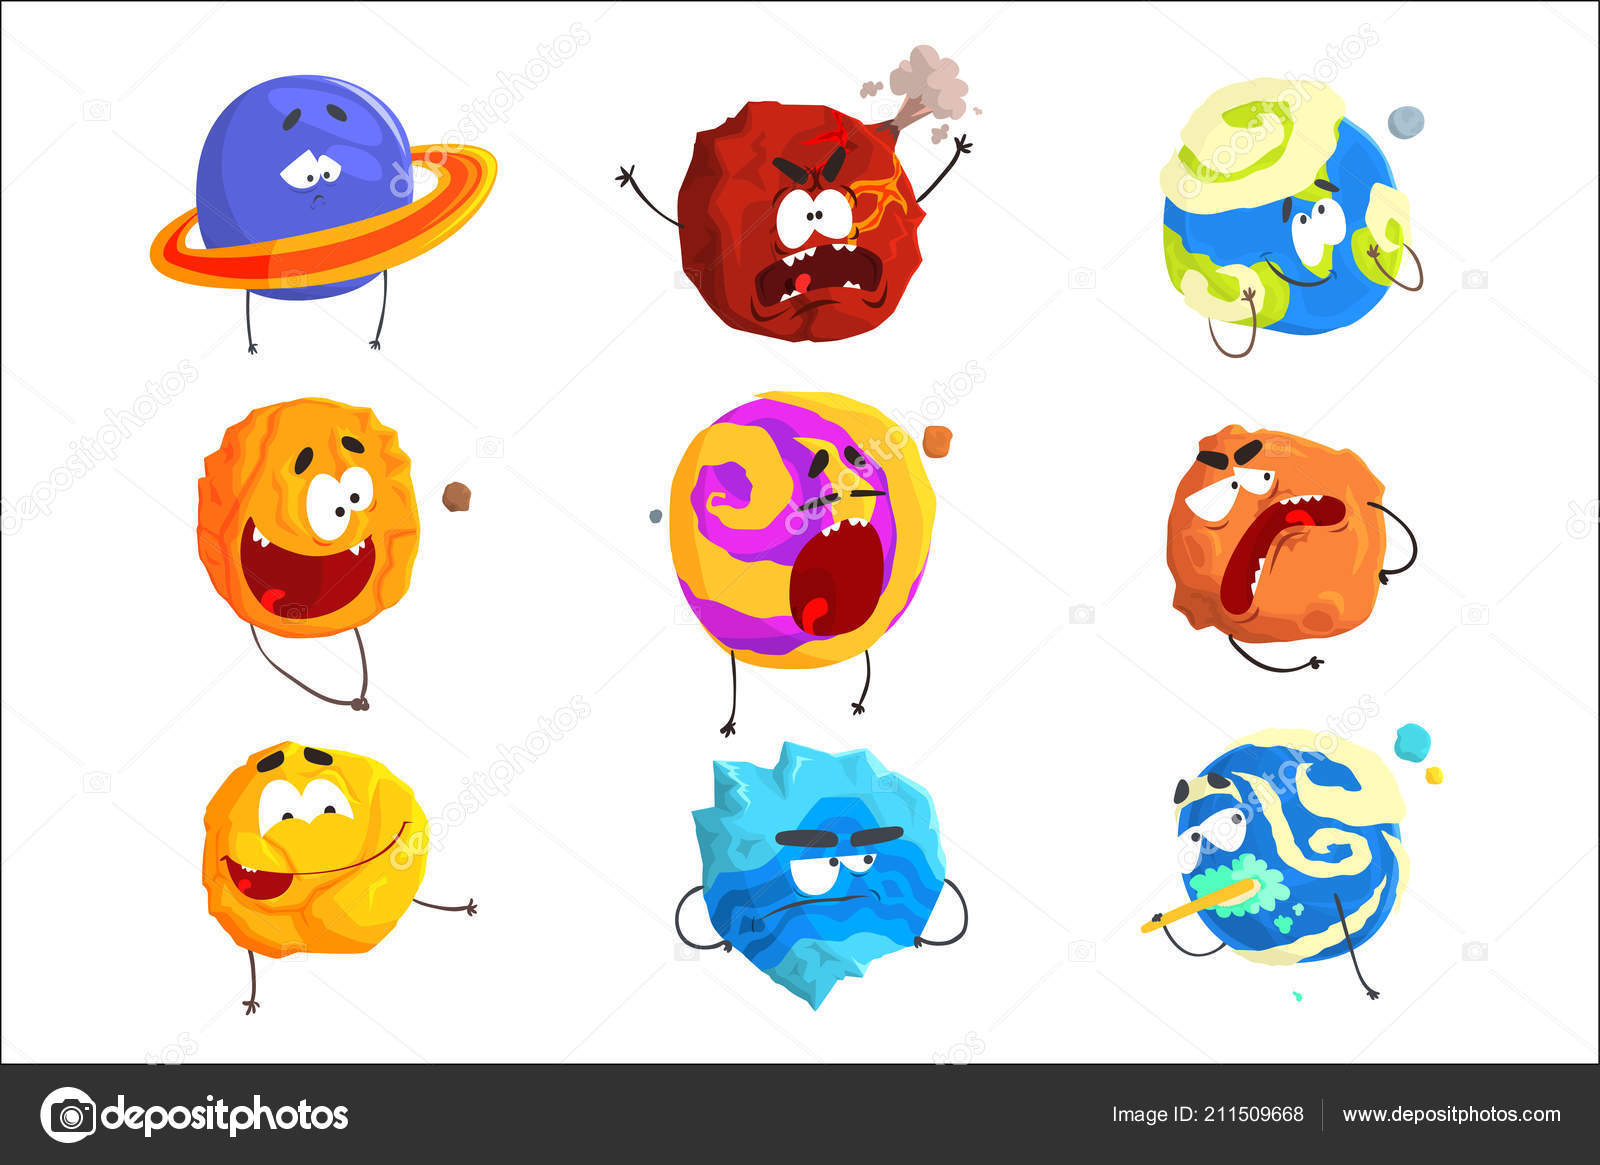 Para Niños De Dibujos Animados Caras Diferentes: Planetas De Colores Dibujos Animados Con Caras Divertidas